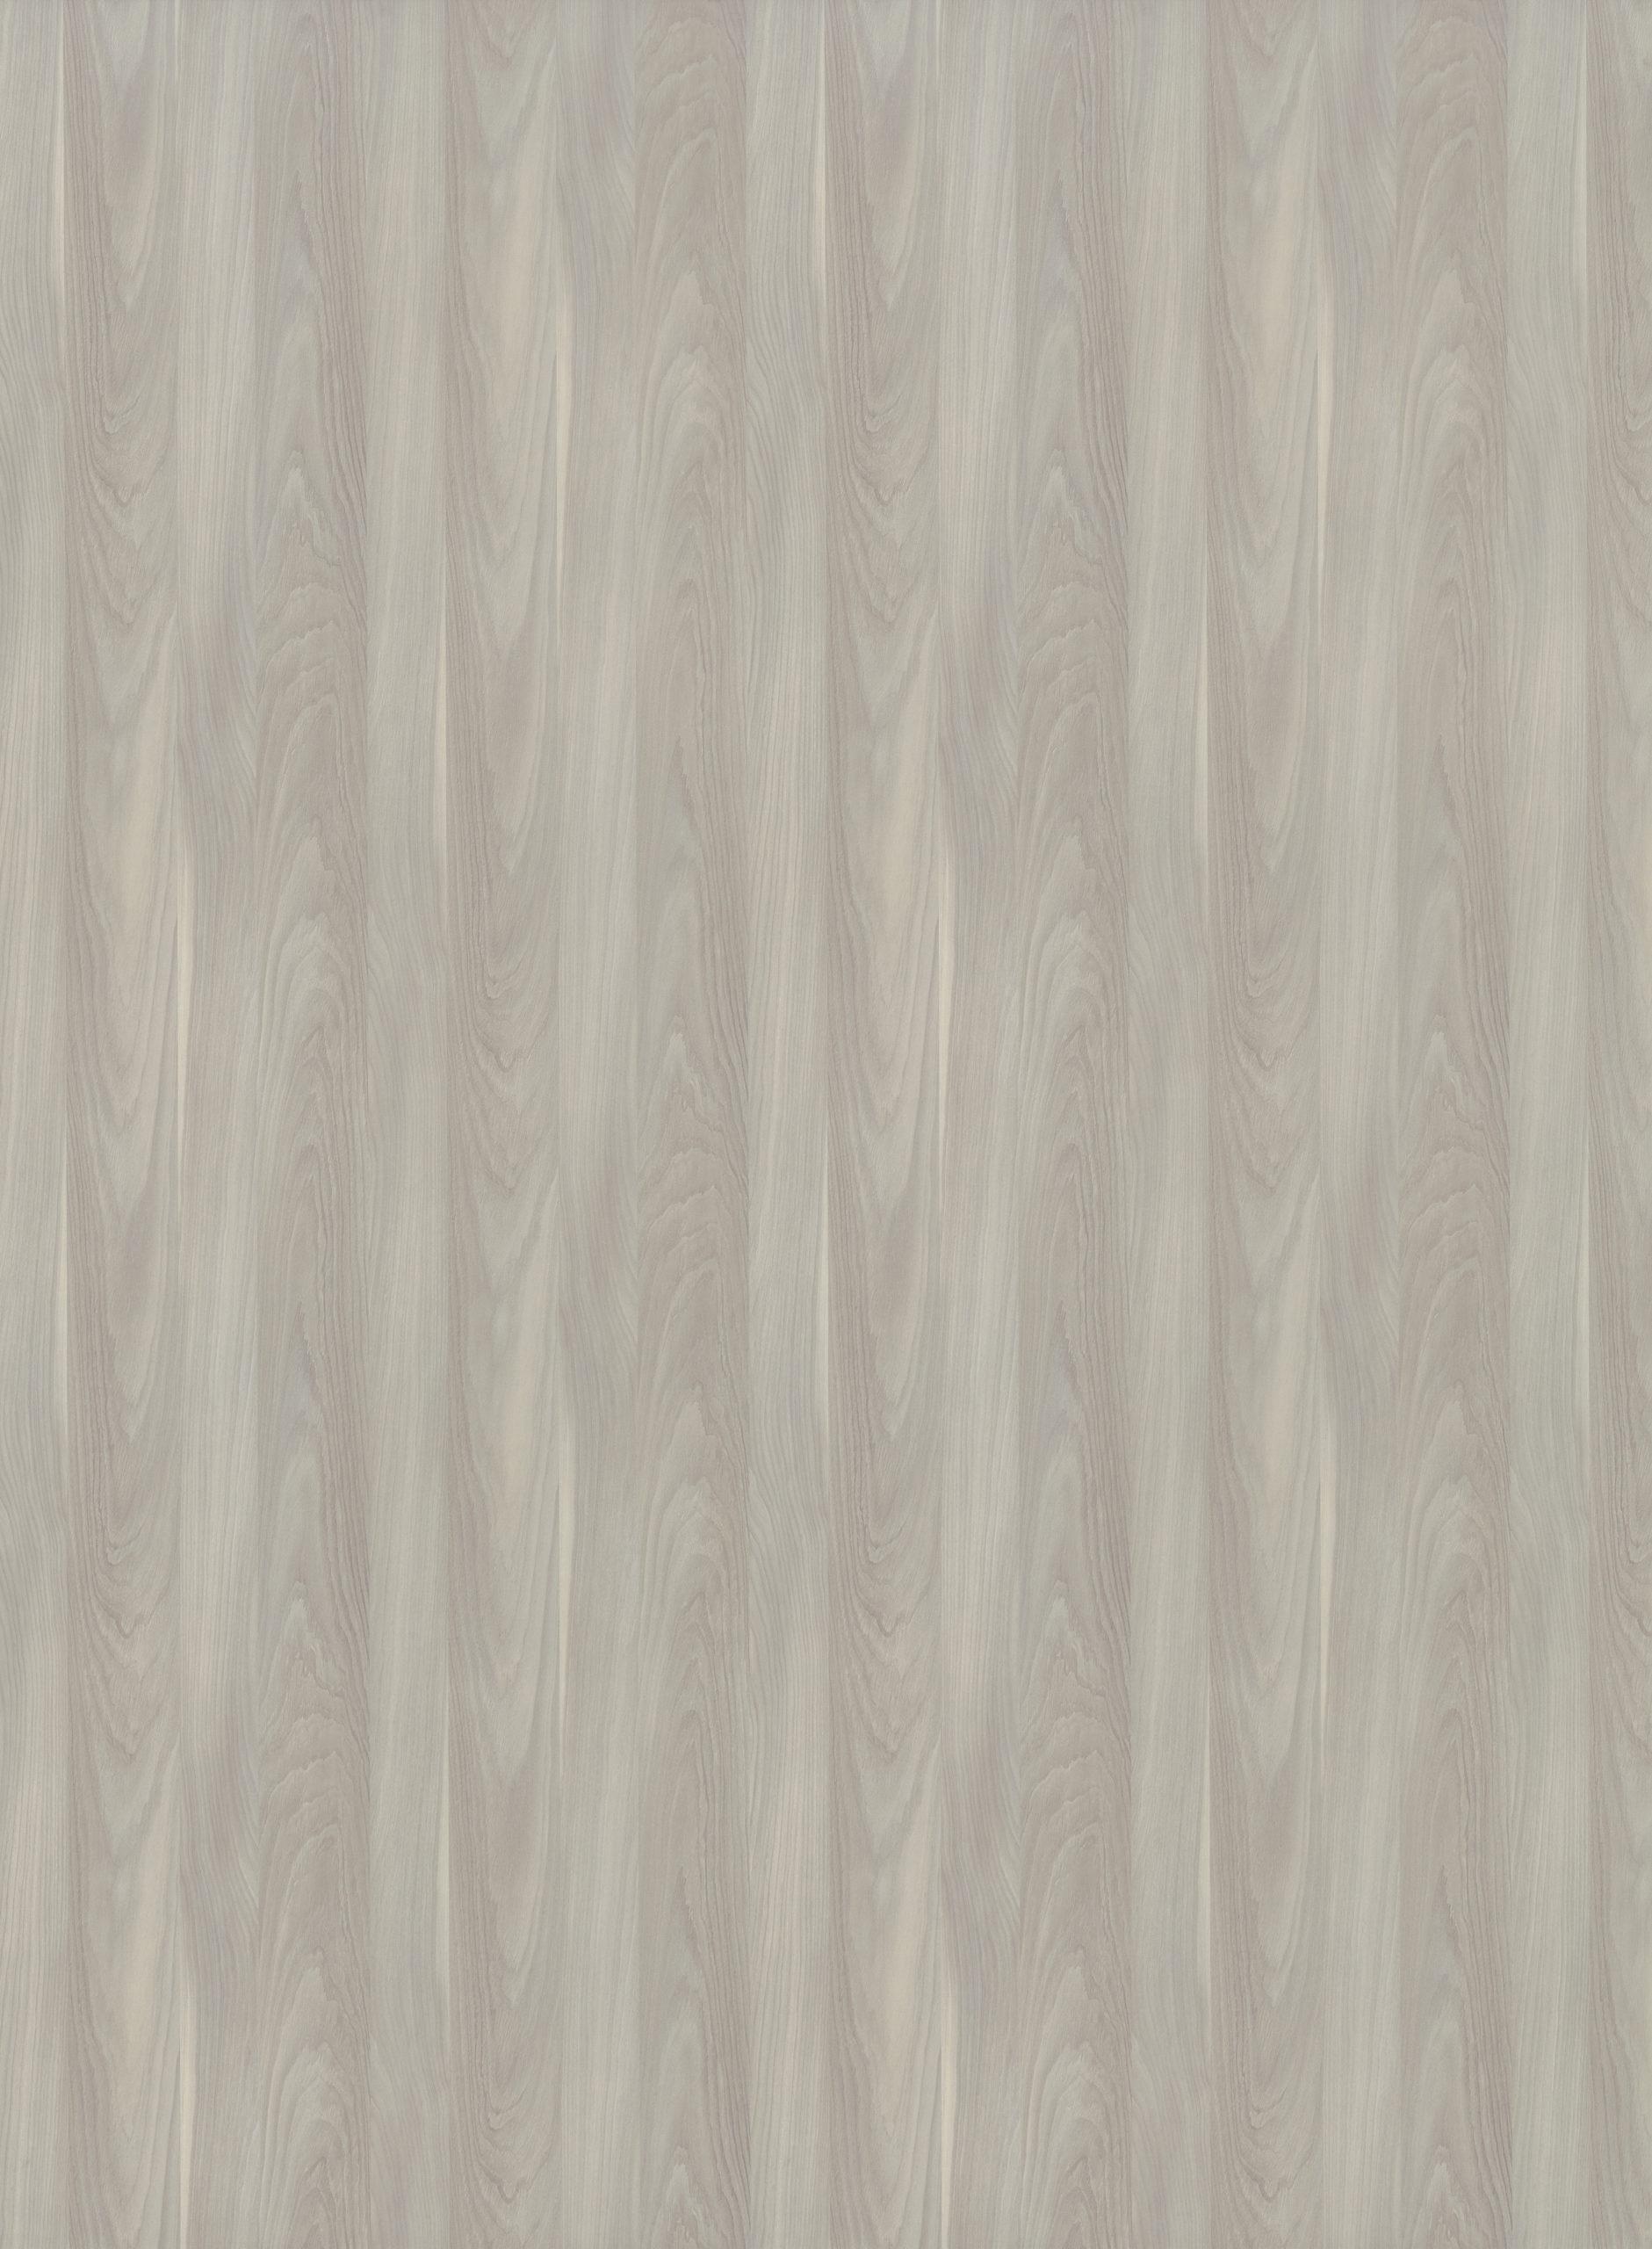 DecoLegno by Cleaf - S010 Yosemite Tekenprogramma 2800x2070mm